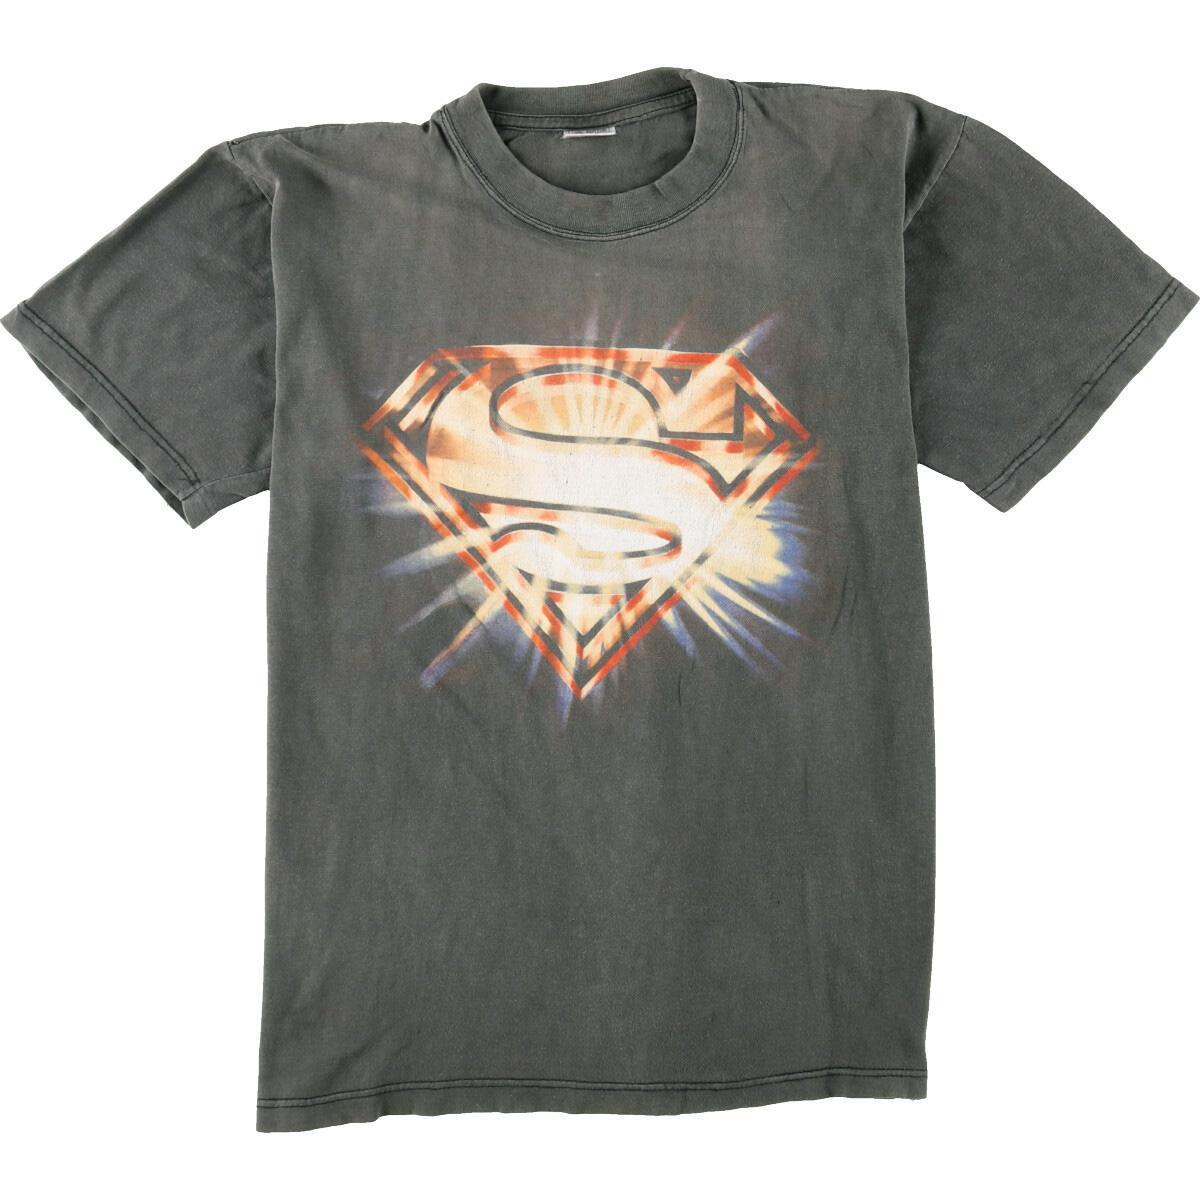 SUPERMAN スーパーマン 映画 ムービーTシャツ メンズM eaa050846 中古 オーバーのアイテム取扱☆ オリジナル 200628 JS2010 KF2012 SS2106 CS2101 SS2012 SS2009 SS2101